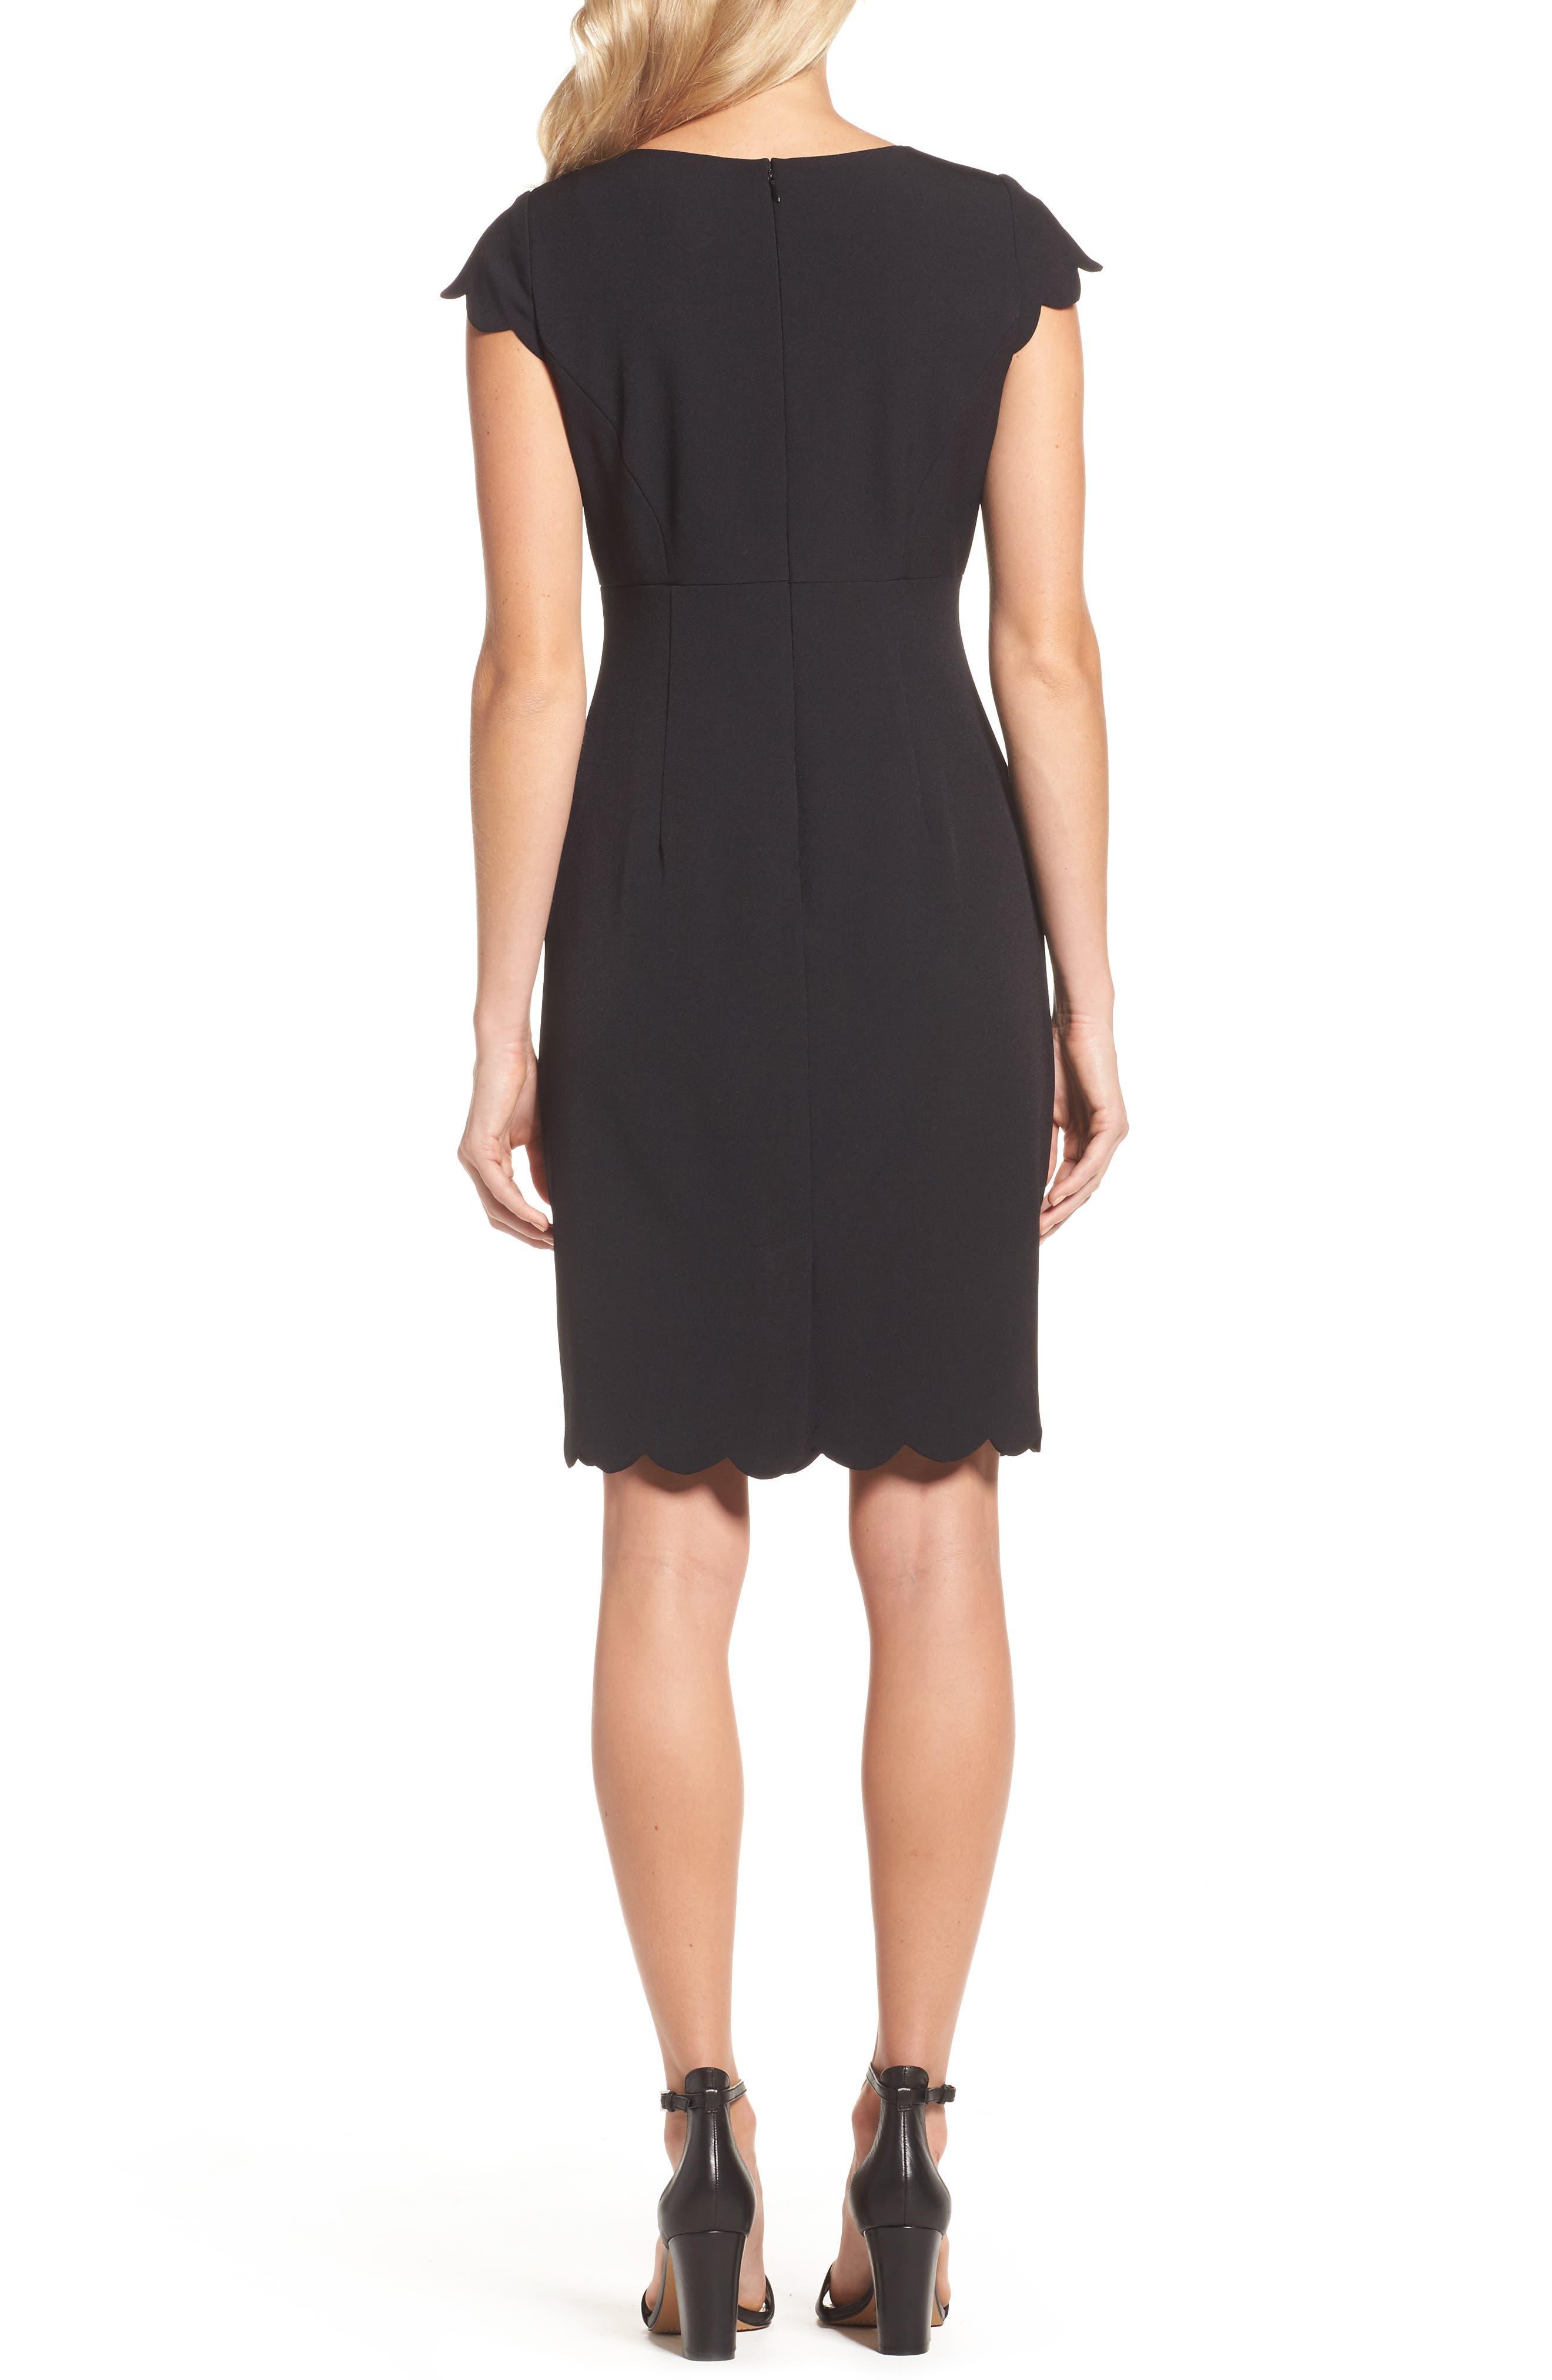 Alternate Image 2  - Adrianna Papell Scalloped Crepe Sheath Dress (Regular & Petite)